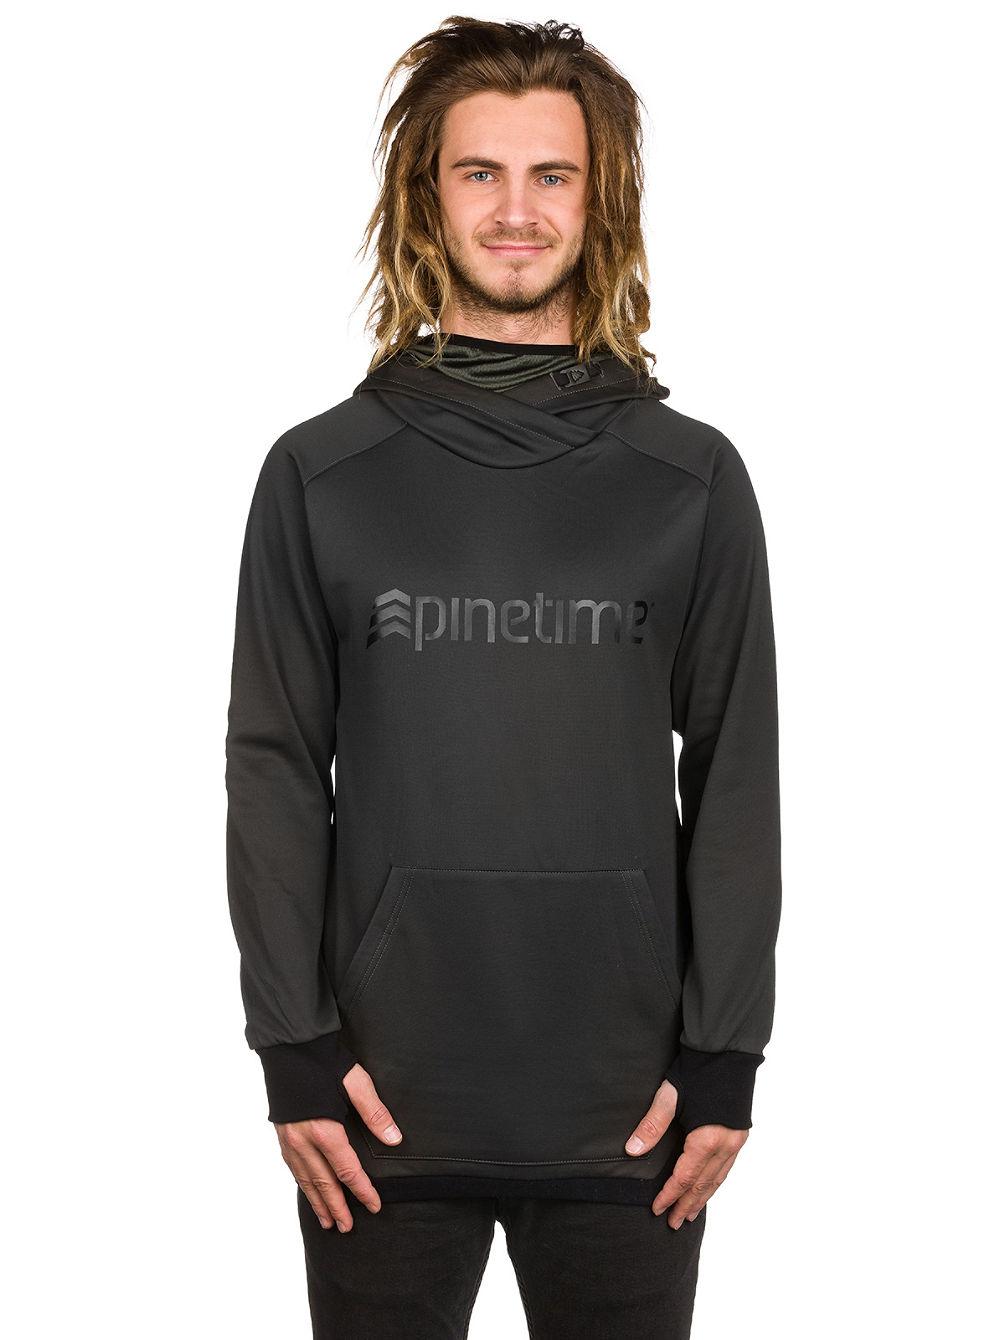 pinetime-caption-hoodie